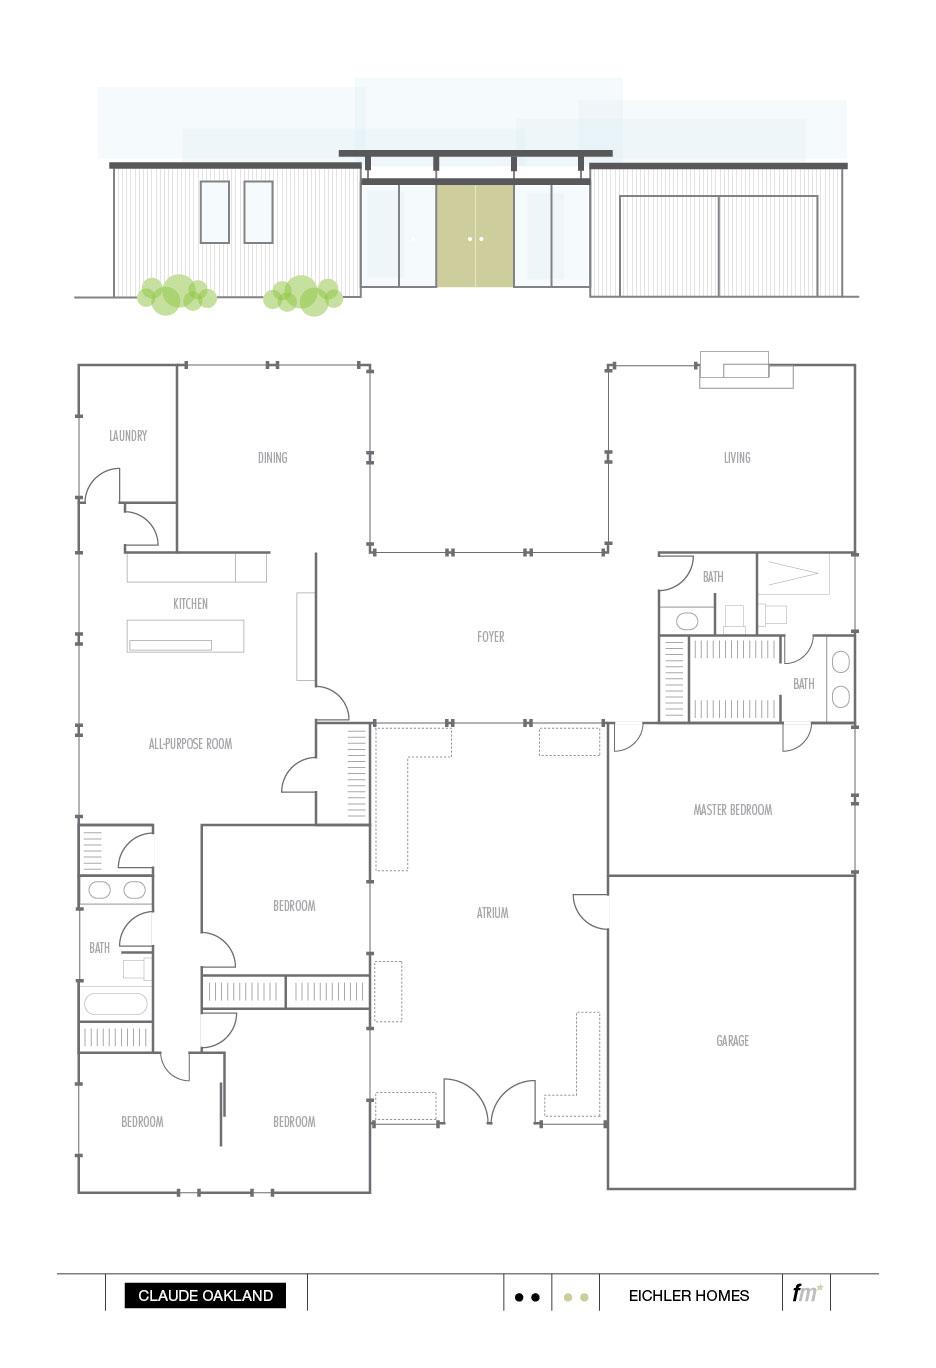 walnut creek – Eichler Homes Floor Plans